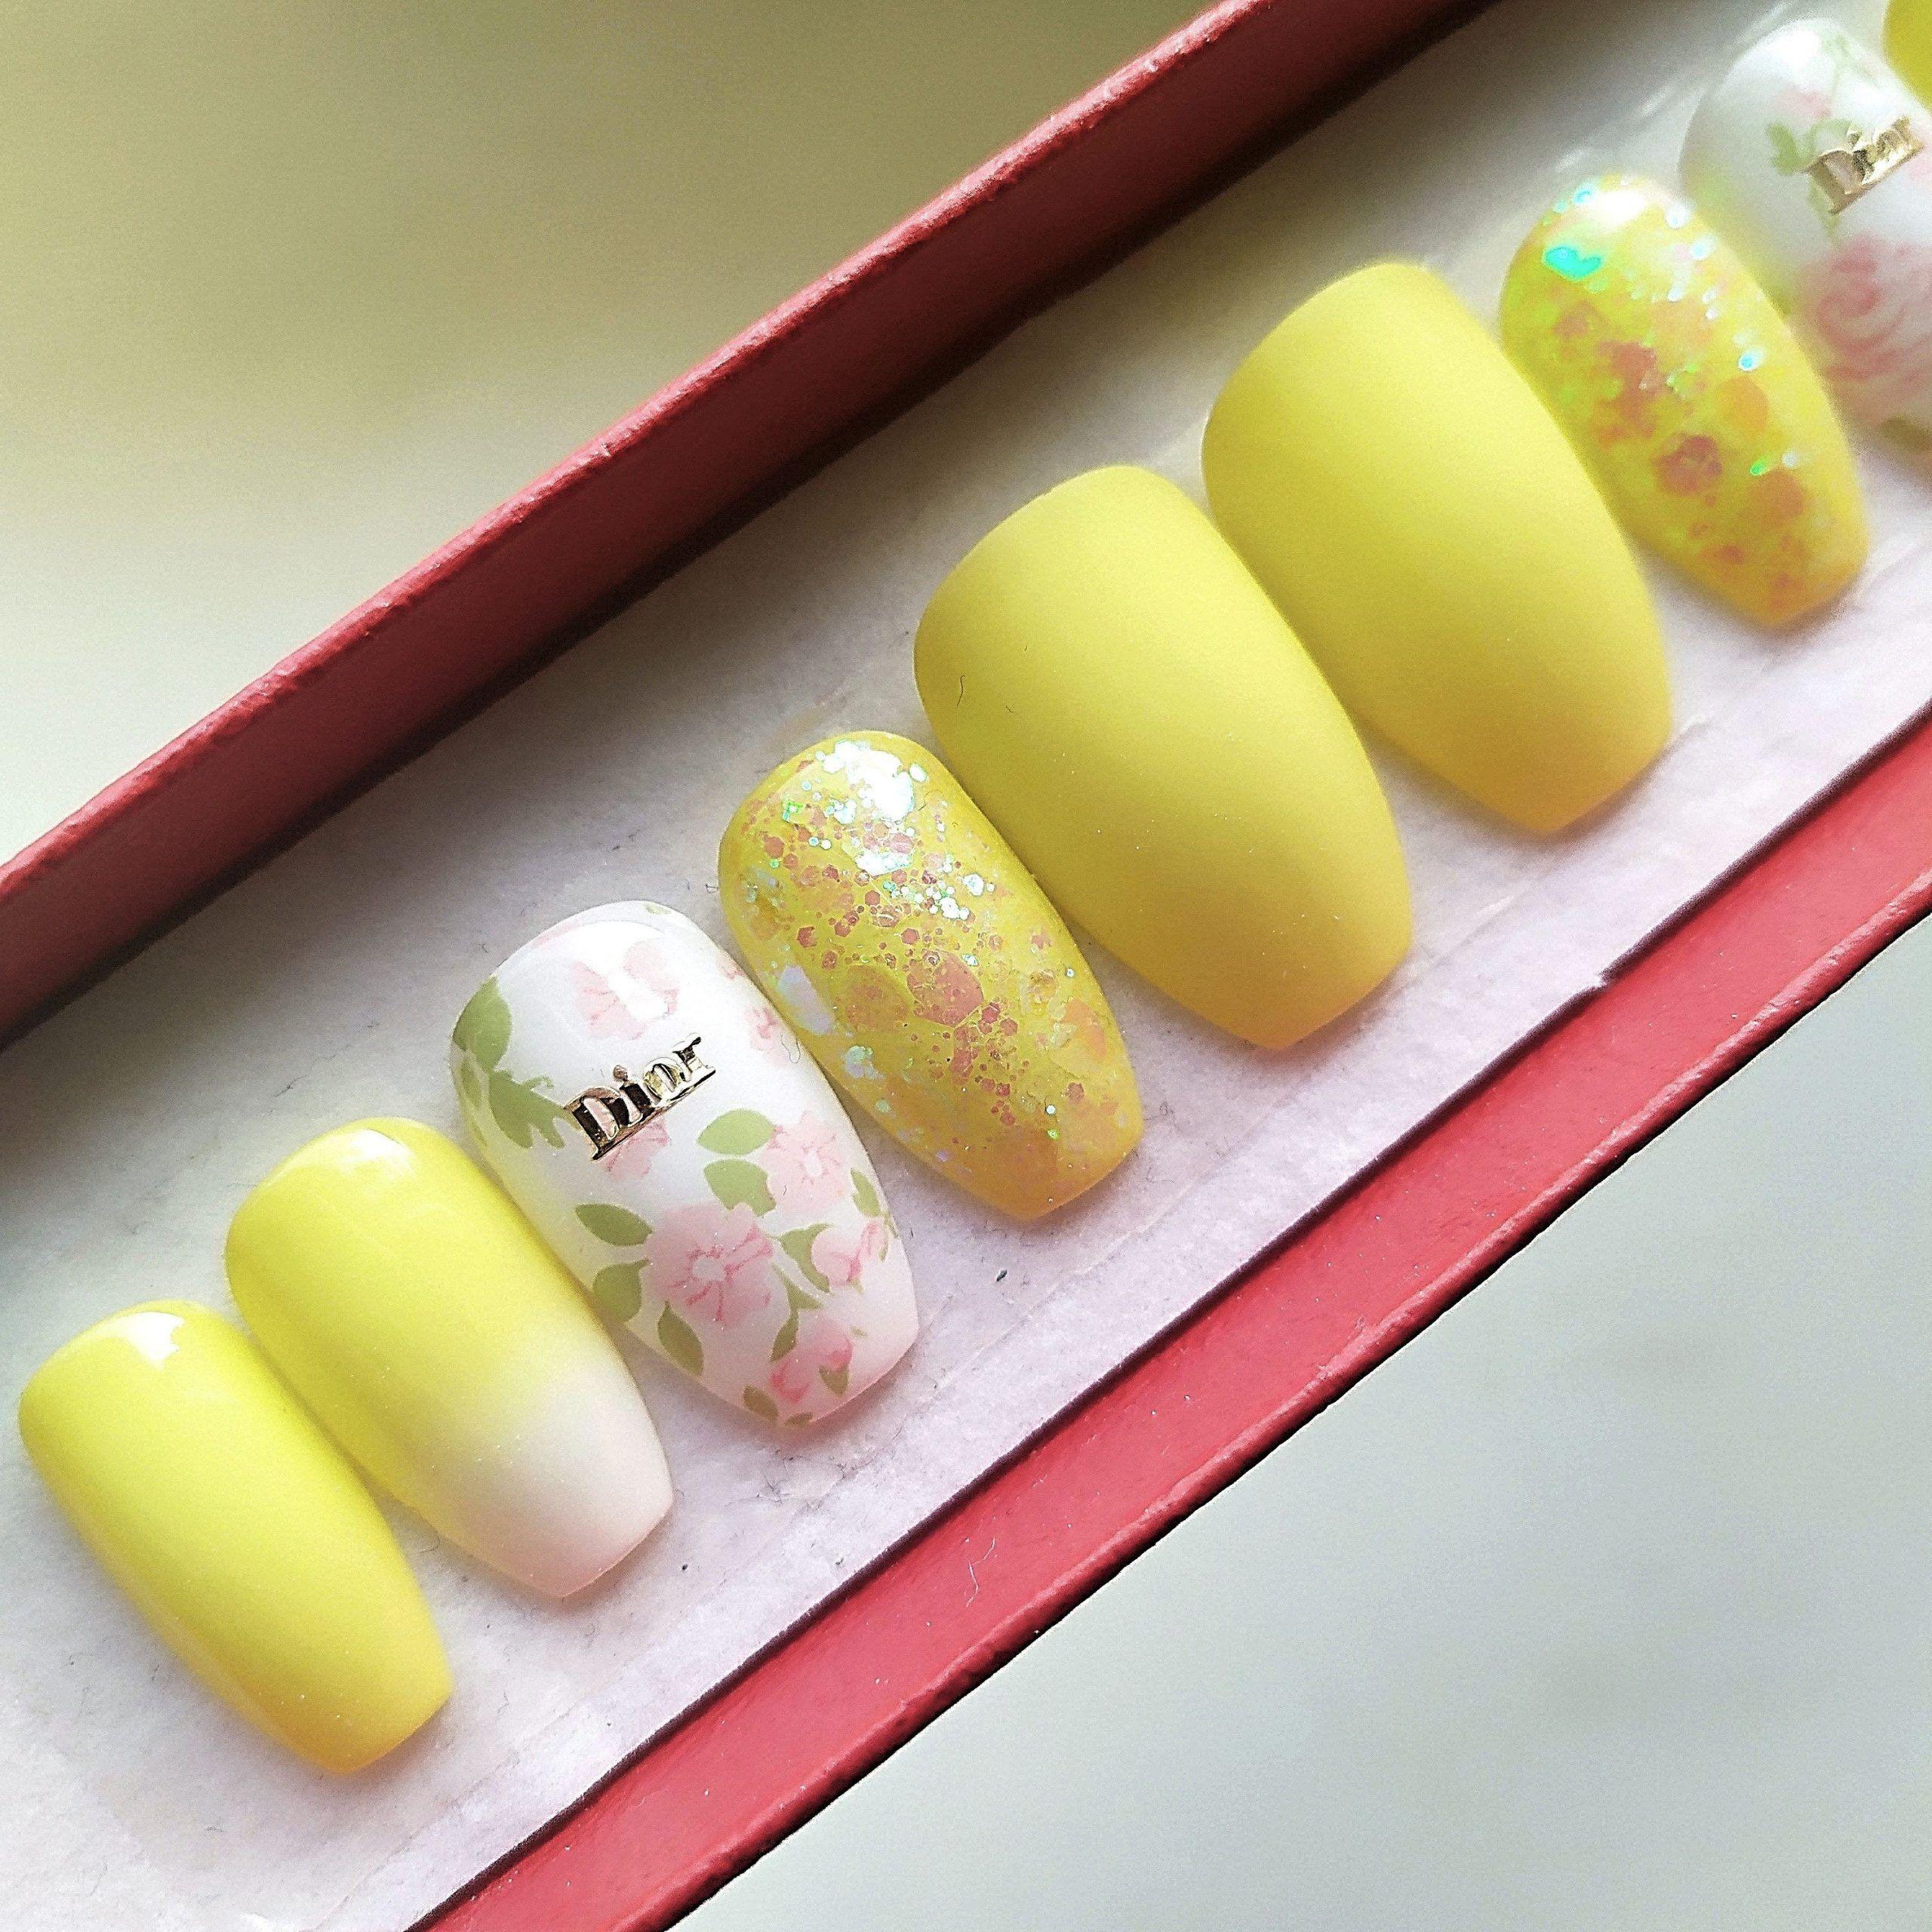 Private Jet Pastel Yellow Press On Nail Set Ombre Matte Nails Short Coffin Nails Custom Design Summer Flower In 2020 Press On Nails Short Coffin Nails Matte Nails